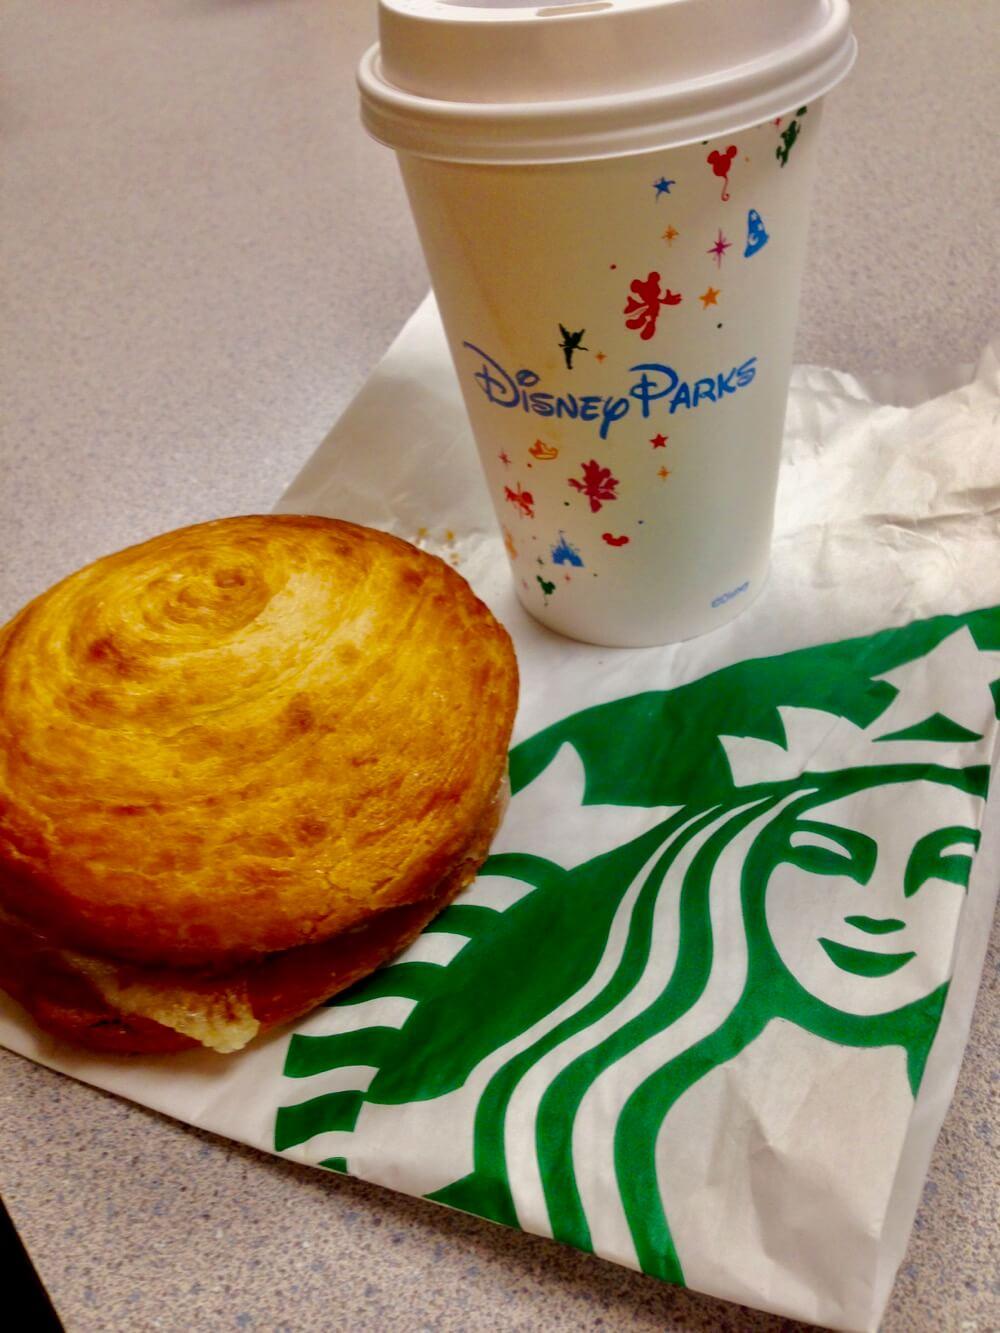 Disney's Hollywood Studios Dining - Starbucks